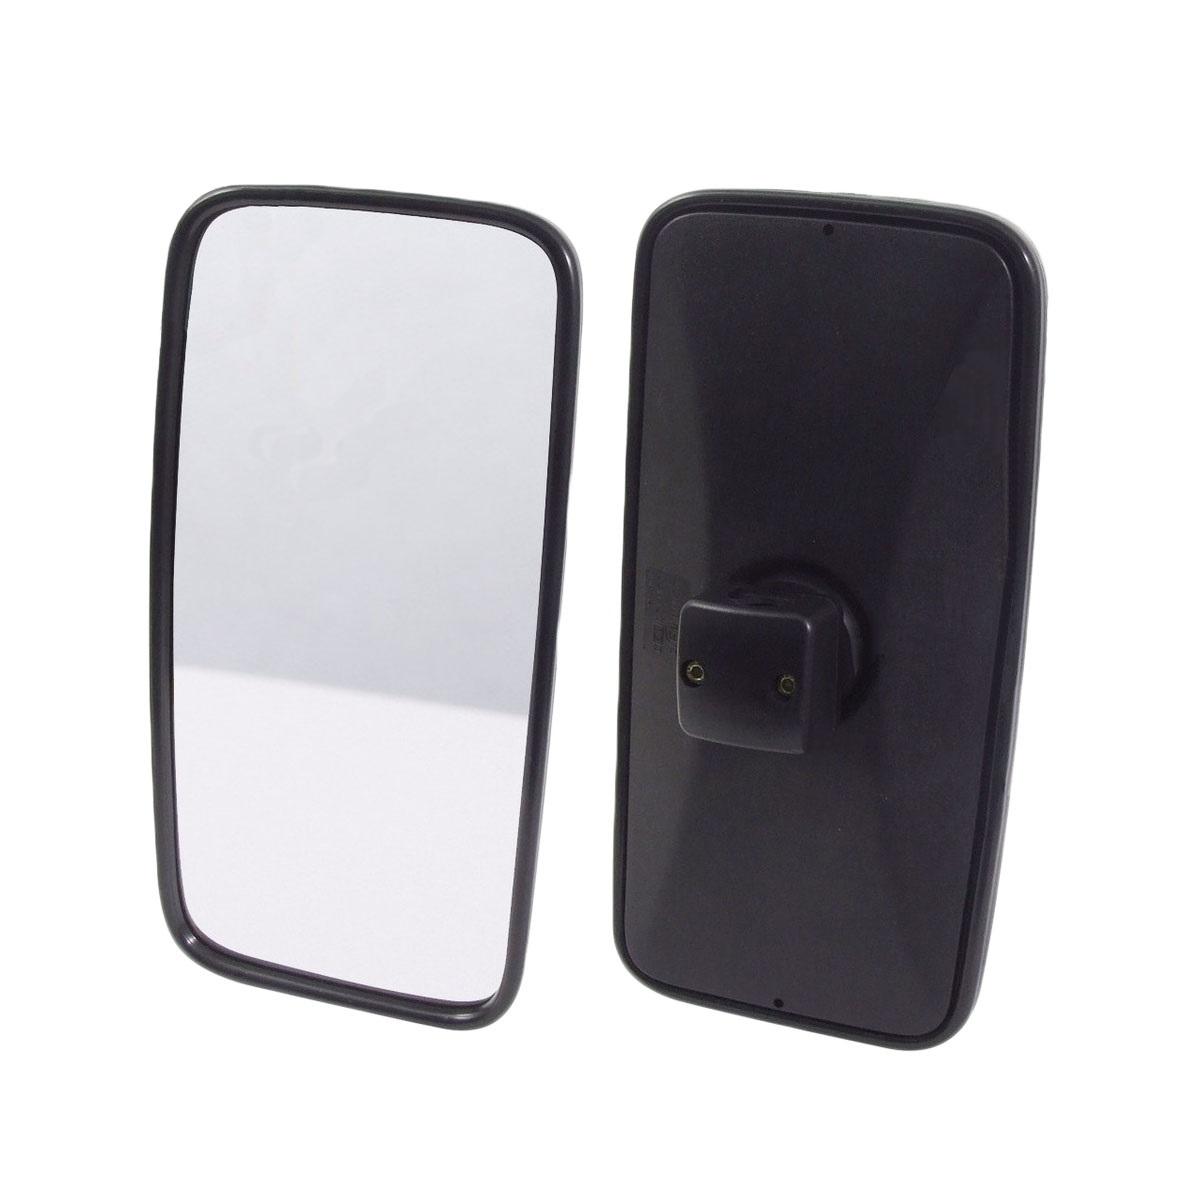 Espelho Retrovisor Mb Axor Atego Manual Vidro Convexo - 36X19 Cm